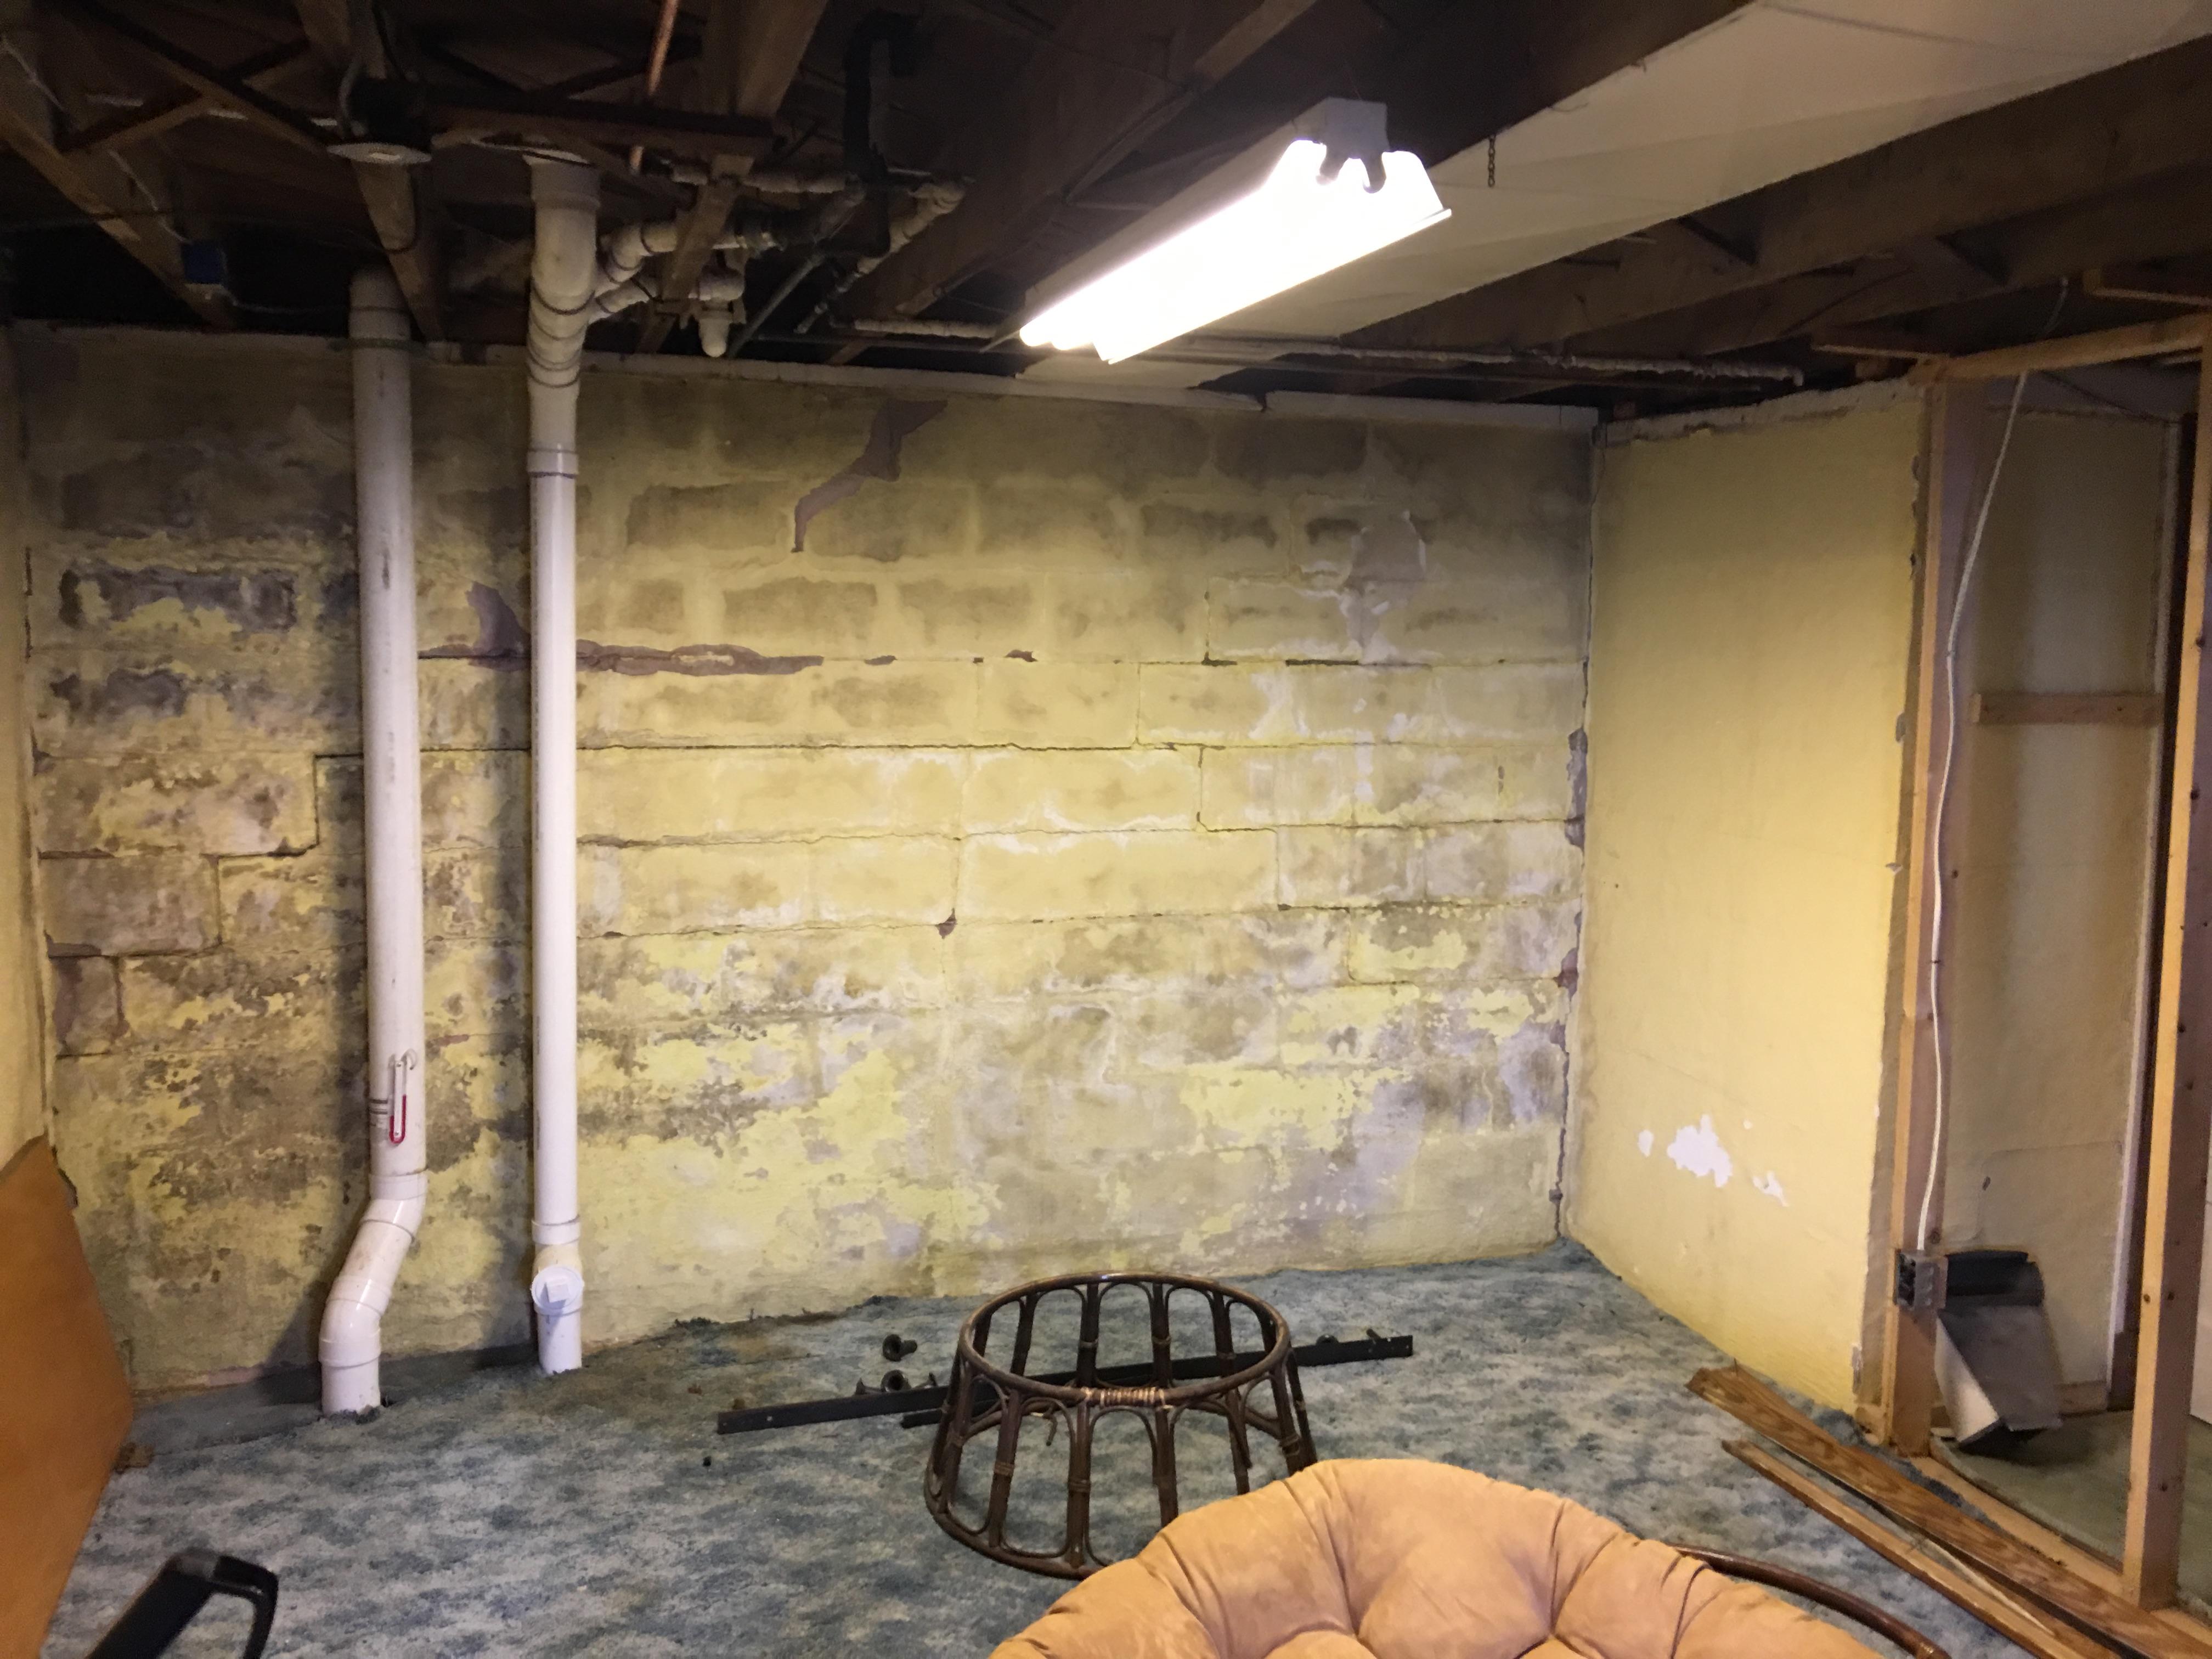 Wet Basement Nightmares In Pittsburgh, PA